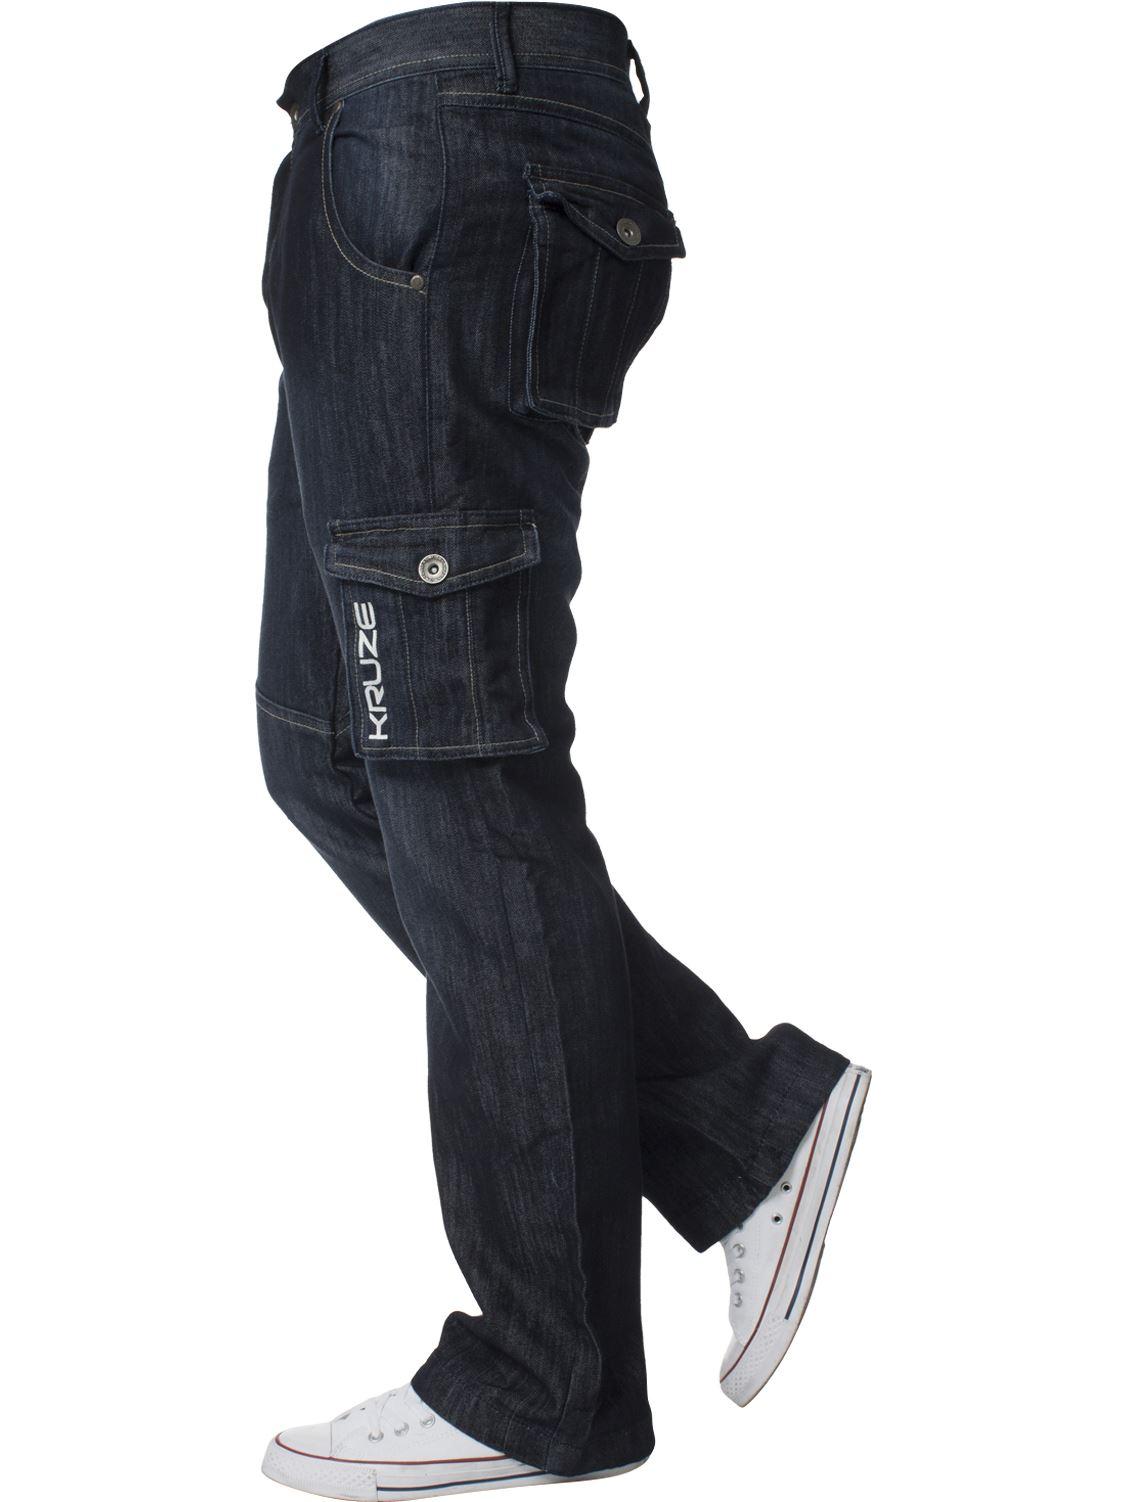 Grandes-jeans-para-hombre-de-combate-de-Kruze-Rey-Alto-Pierna-Cargo-Pantalones-Jeans-Pantalones miniatura 13